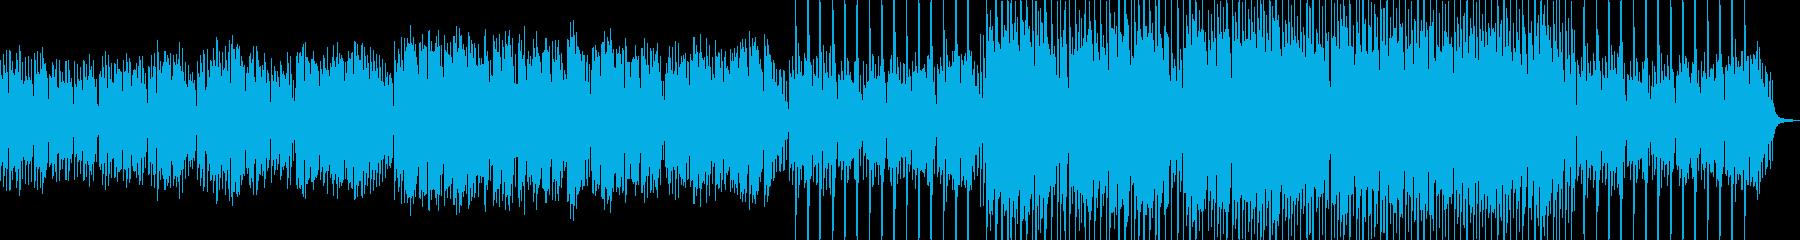 pingpong-ほのぼのオシャレの再生済みの波形